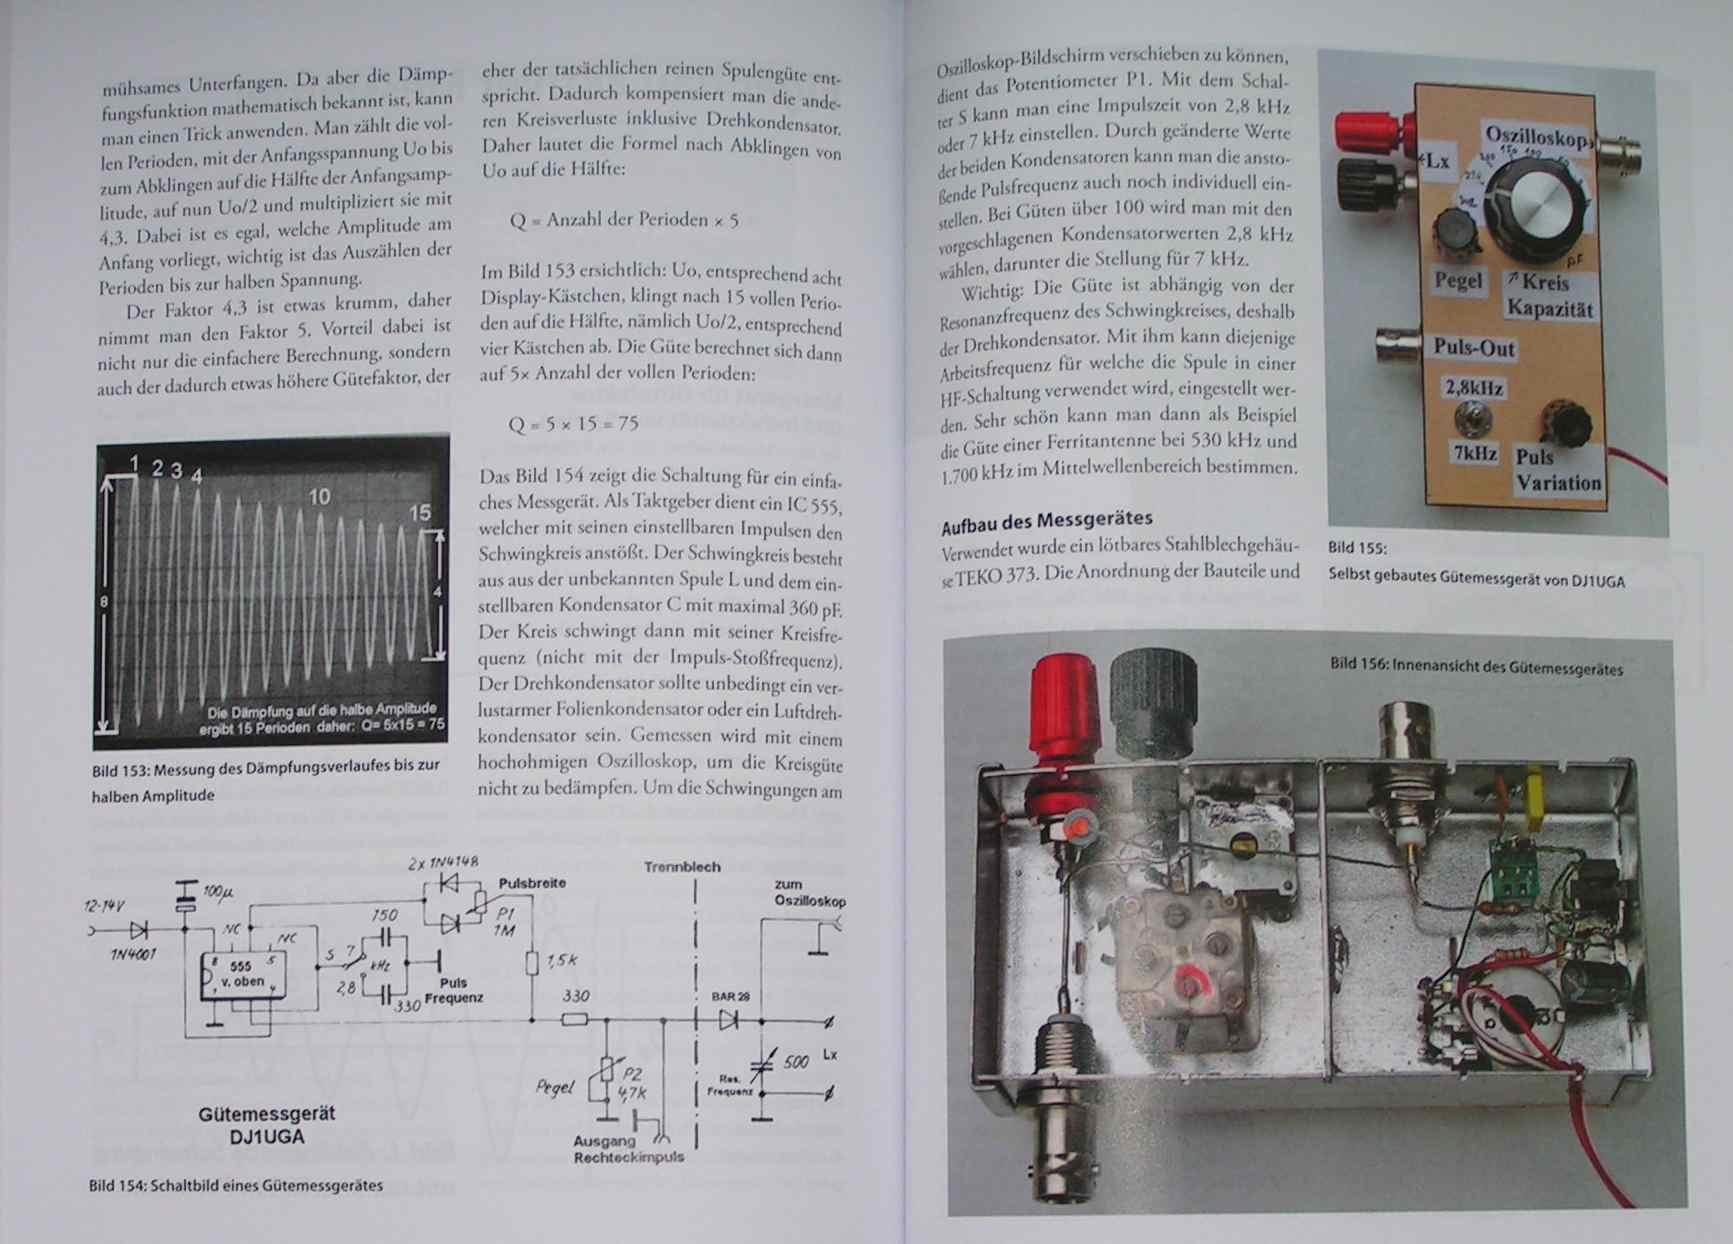 QDM Rohde und Schwarz Gütefaktormessgerät - Mikrocontroller.net